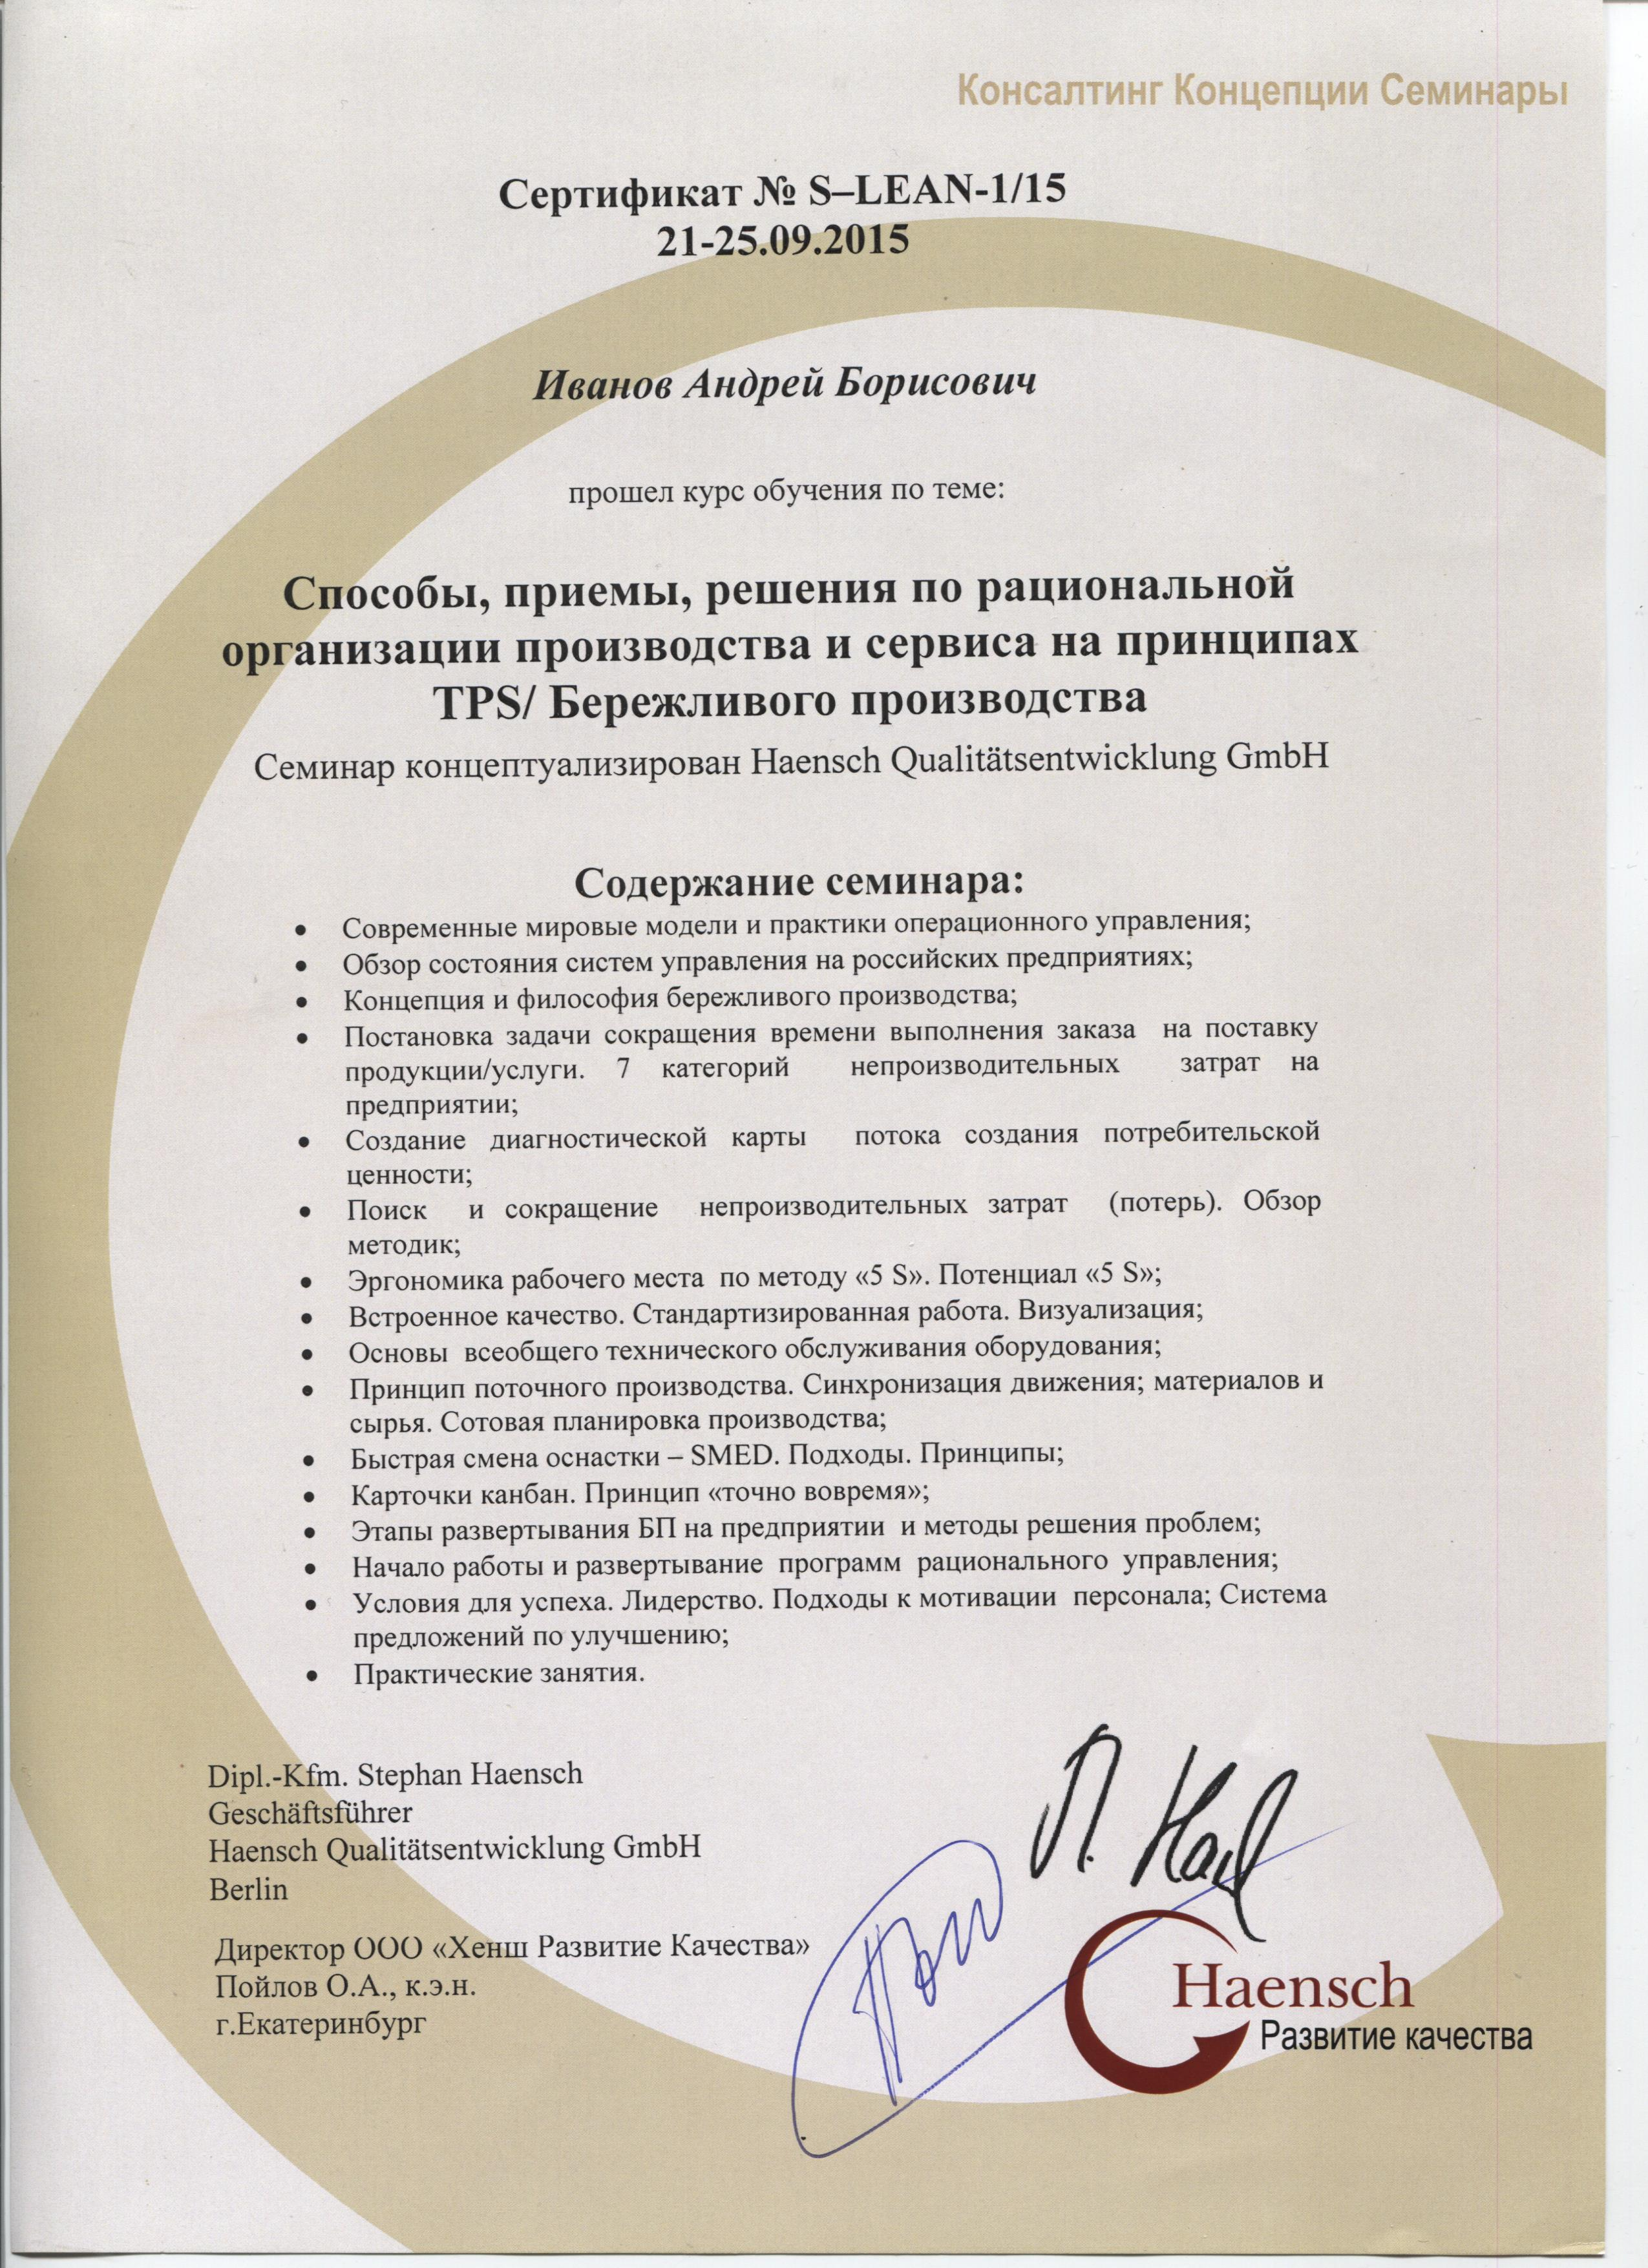 Иванов А.Б. - Курсы по бережливому производству